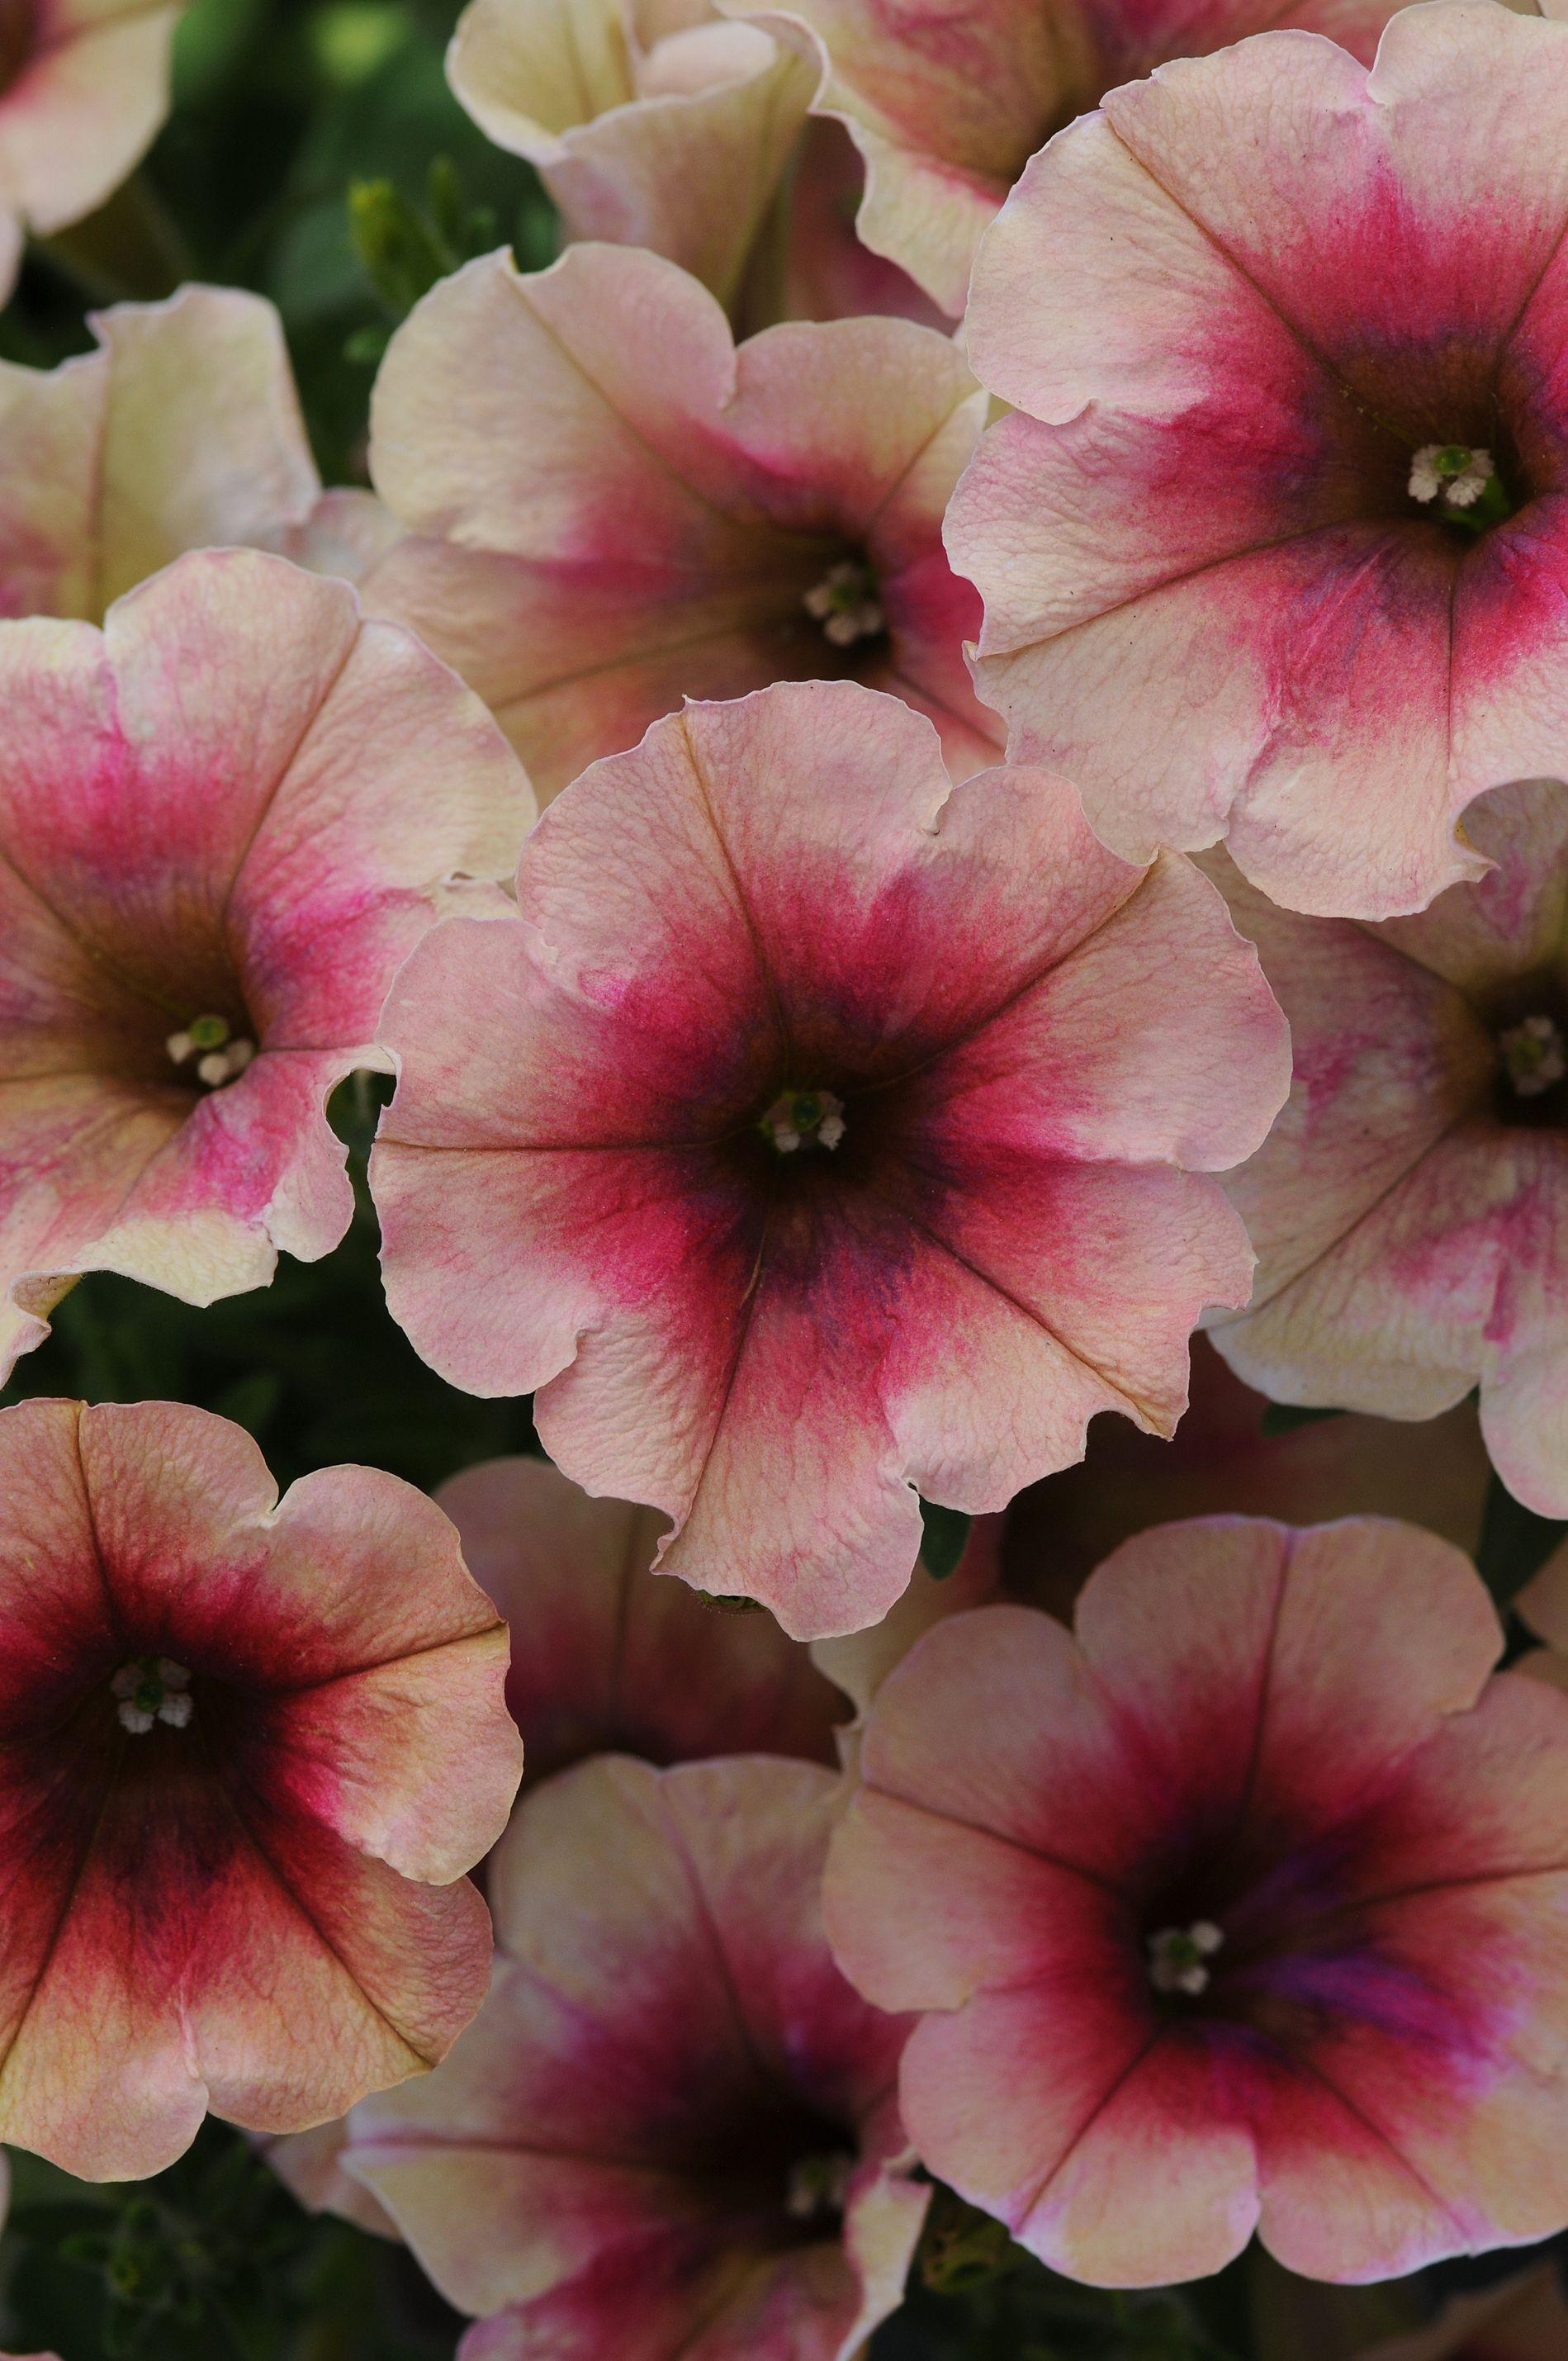 Petunia Suncatcher Vintage Rose Ball Horticultural Co Petunia Flower Petunias Flower Seeds